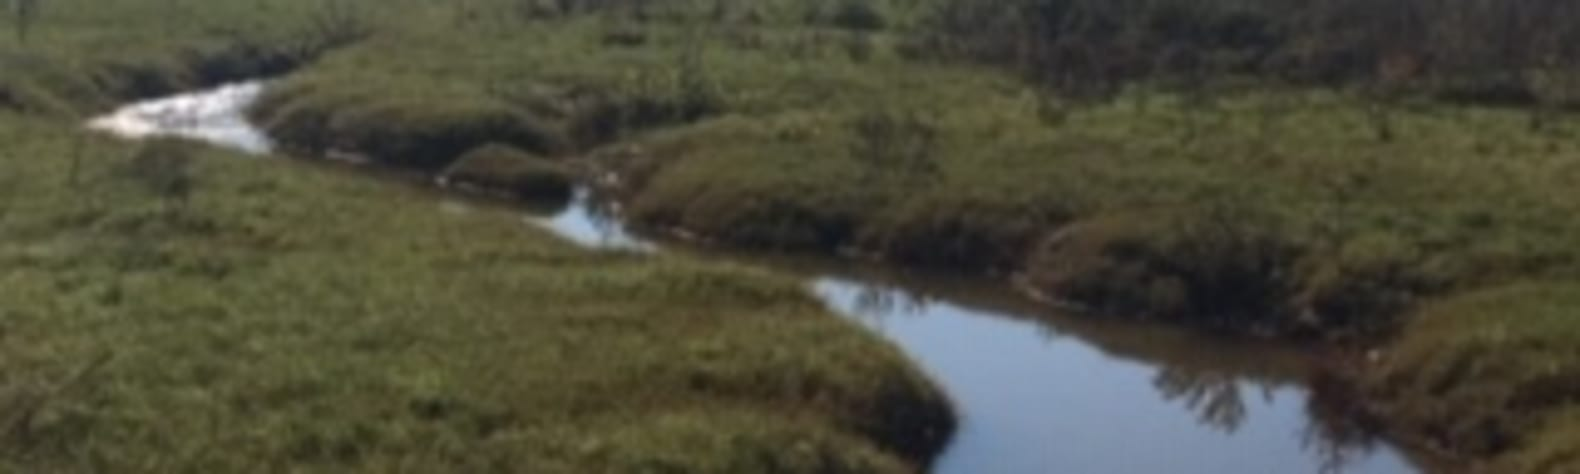 ARROWHEAD HILL RANCH